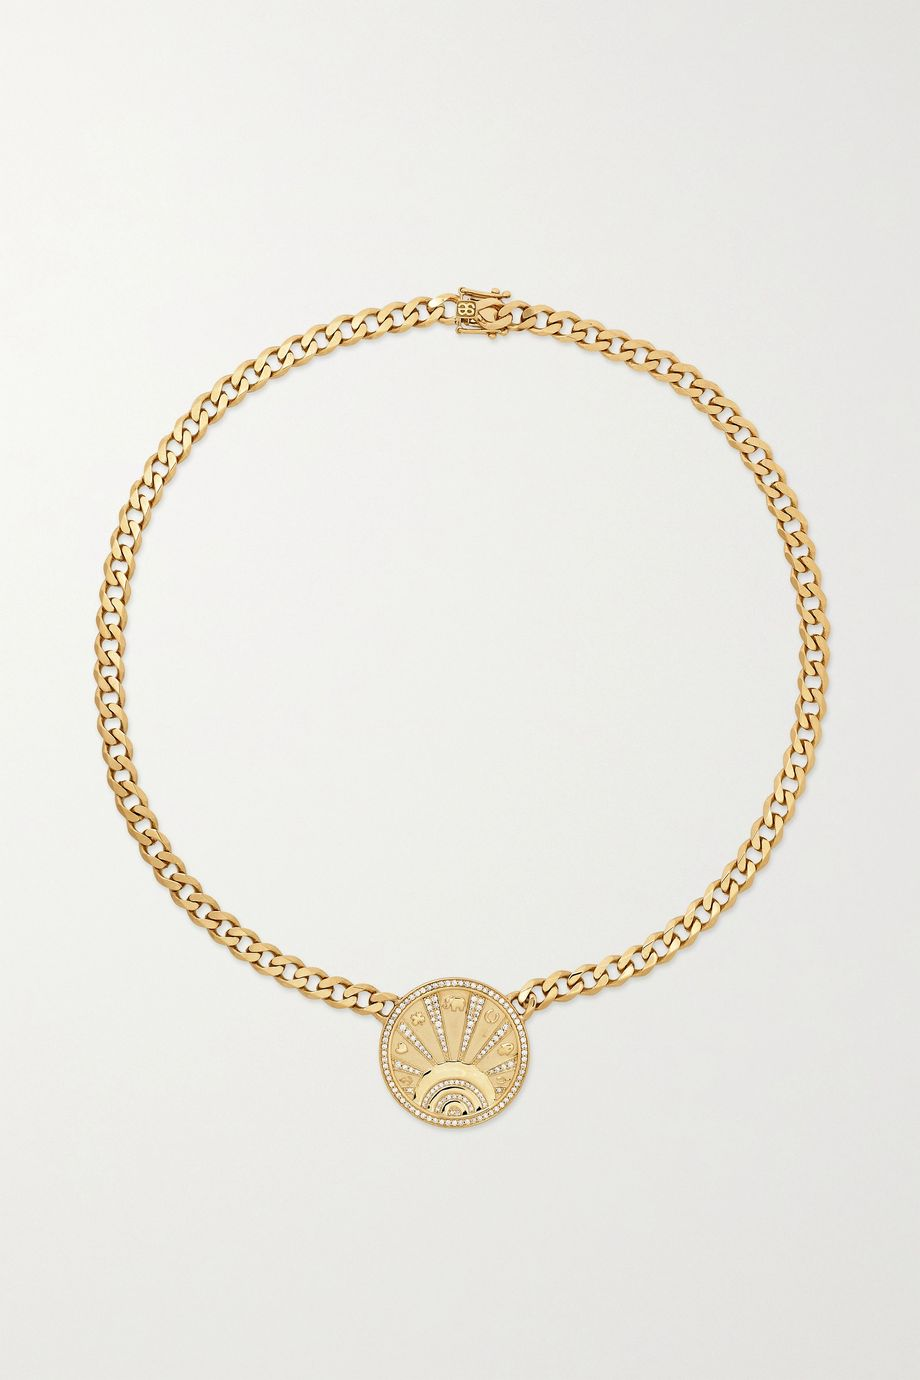 Sydney Evan Collier en or 14 carats et diamants